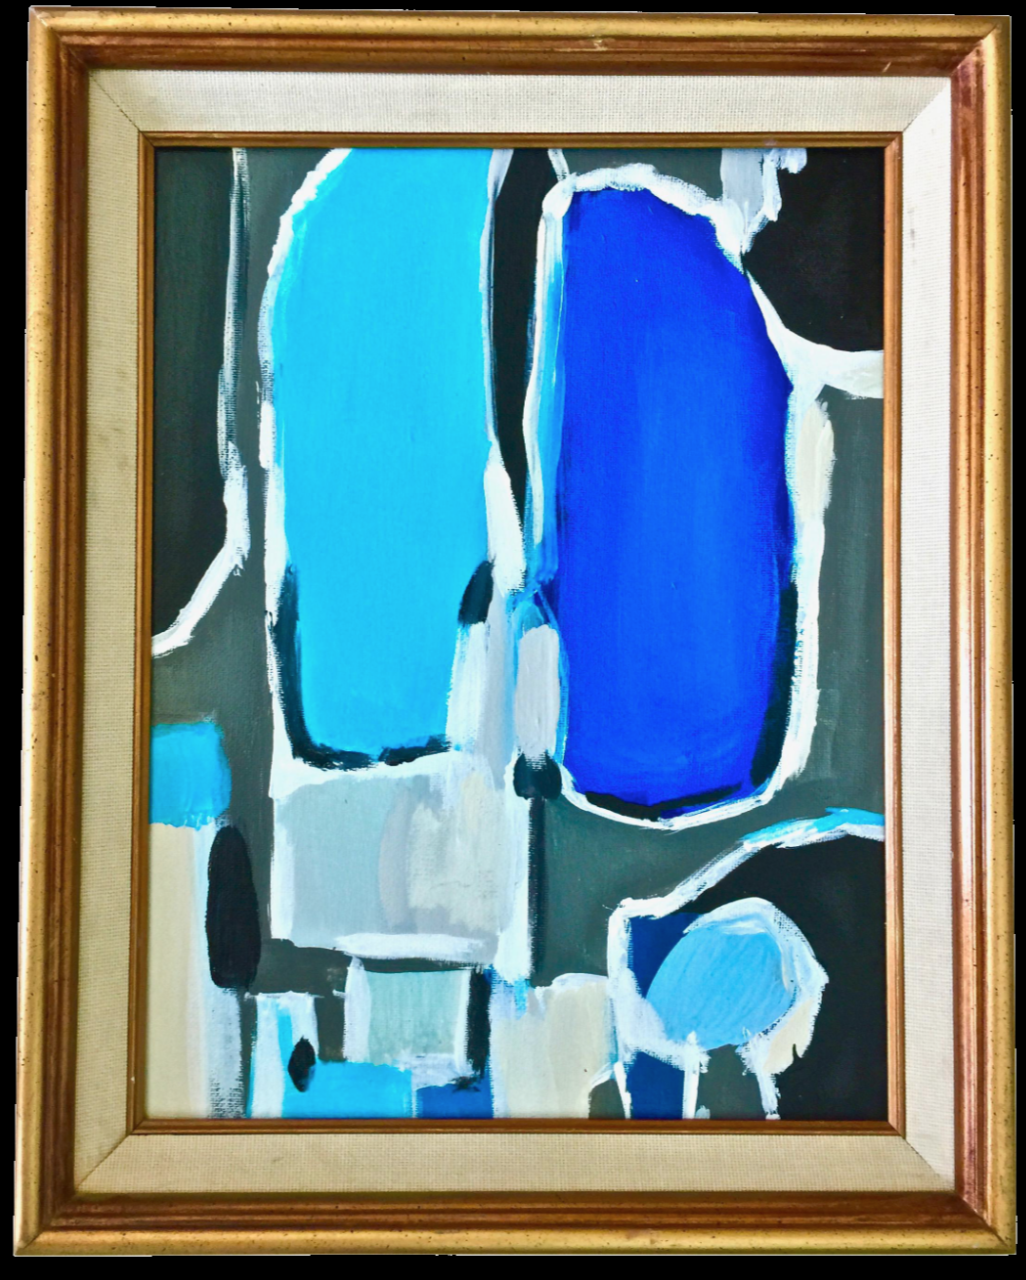 Title: Blue on Blue